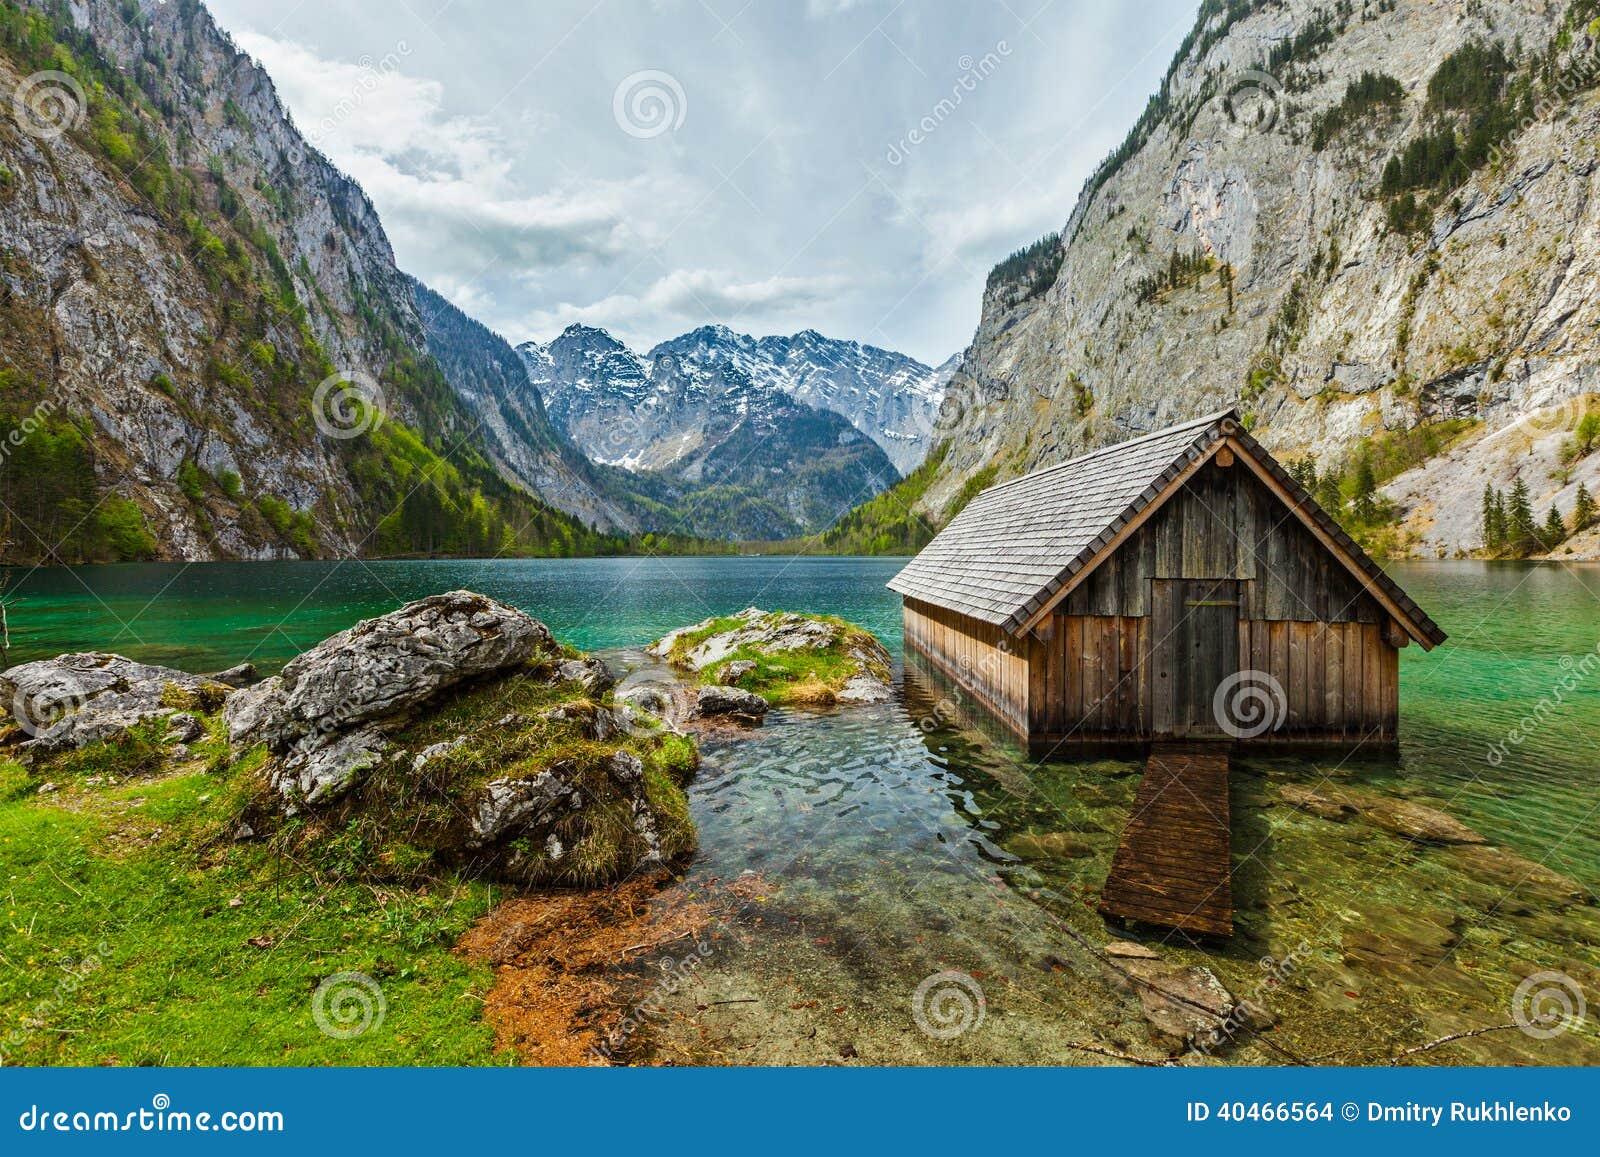 Boat Dock On Obersee Lake. Bavaria, Germany Stock Photo - Image: 40466564